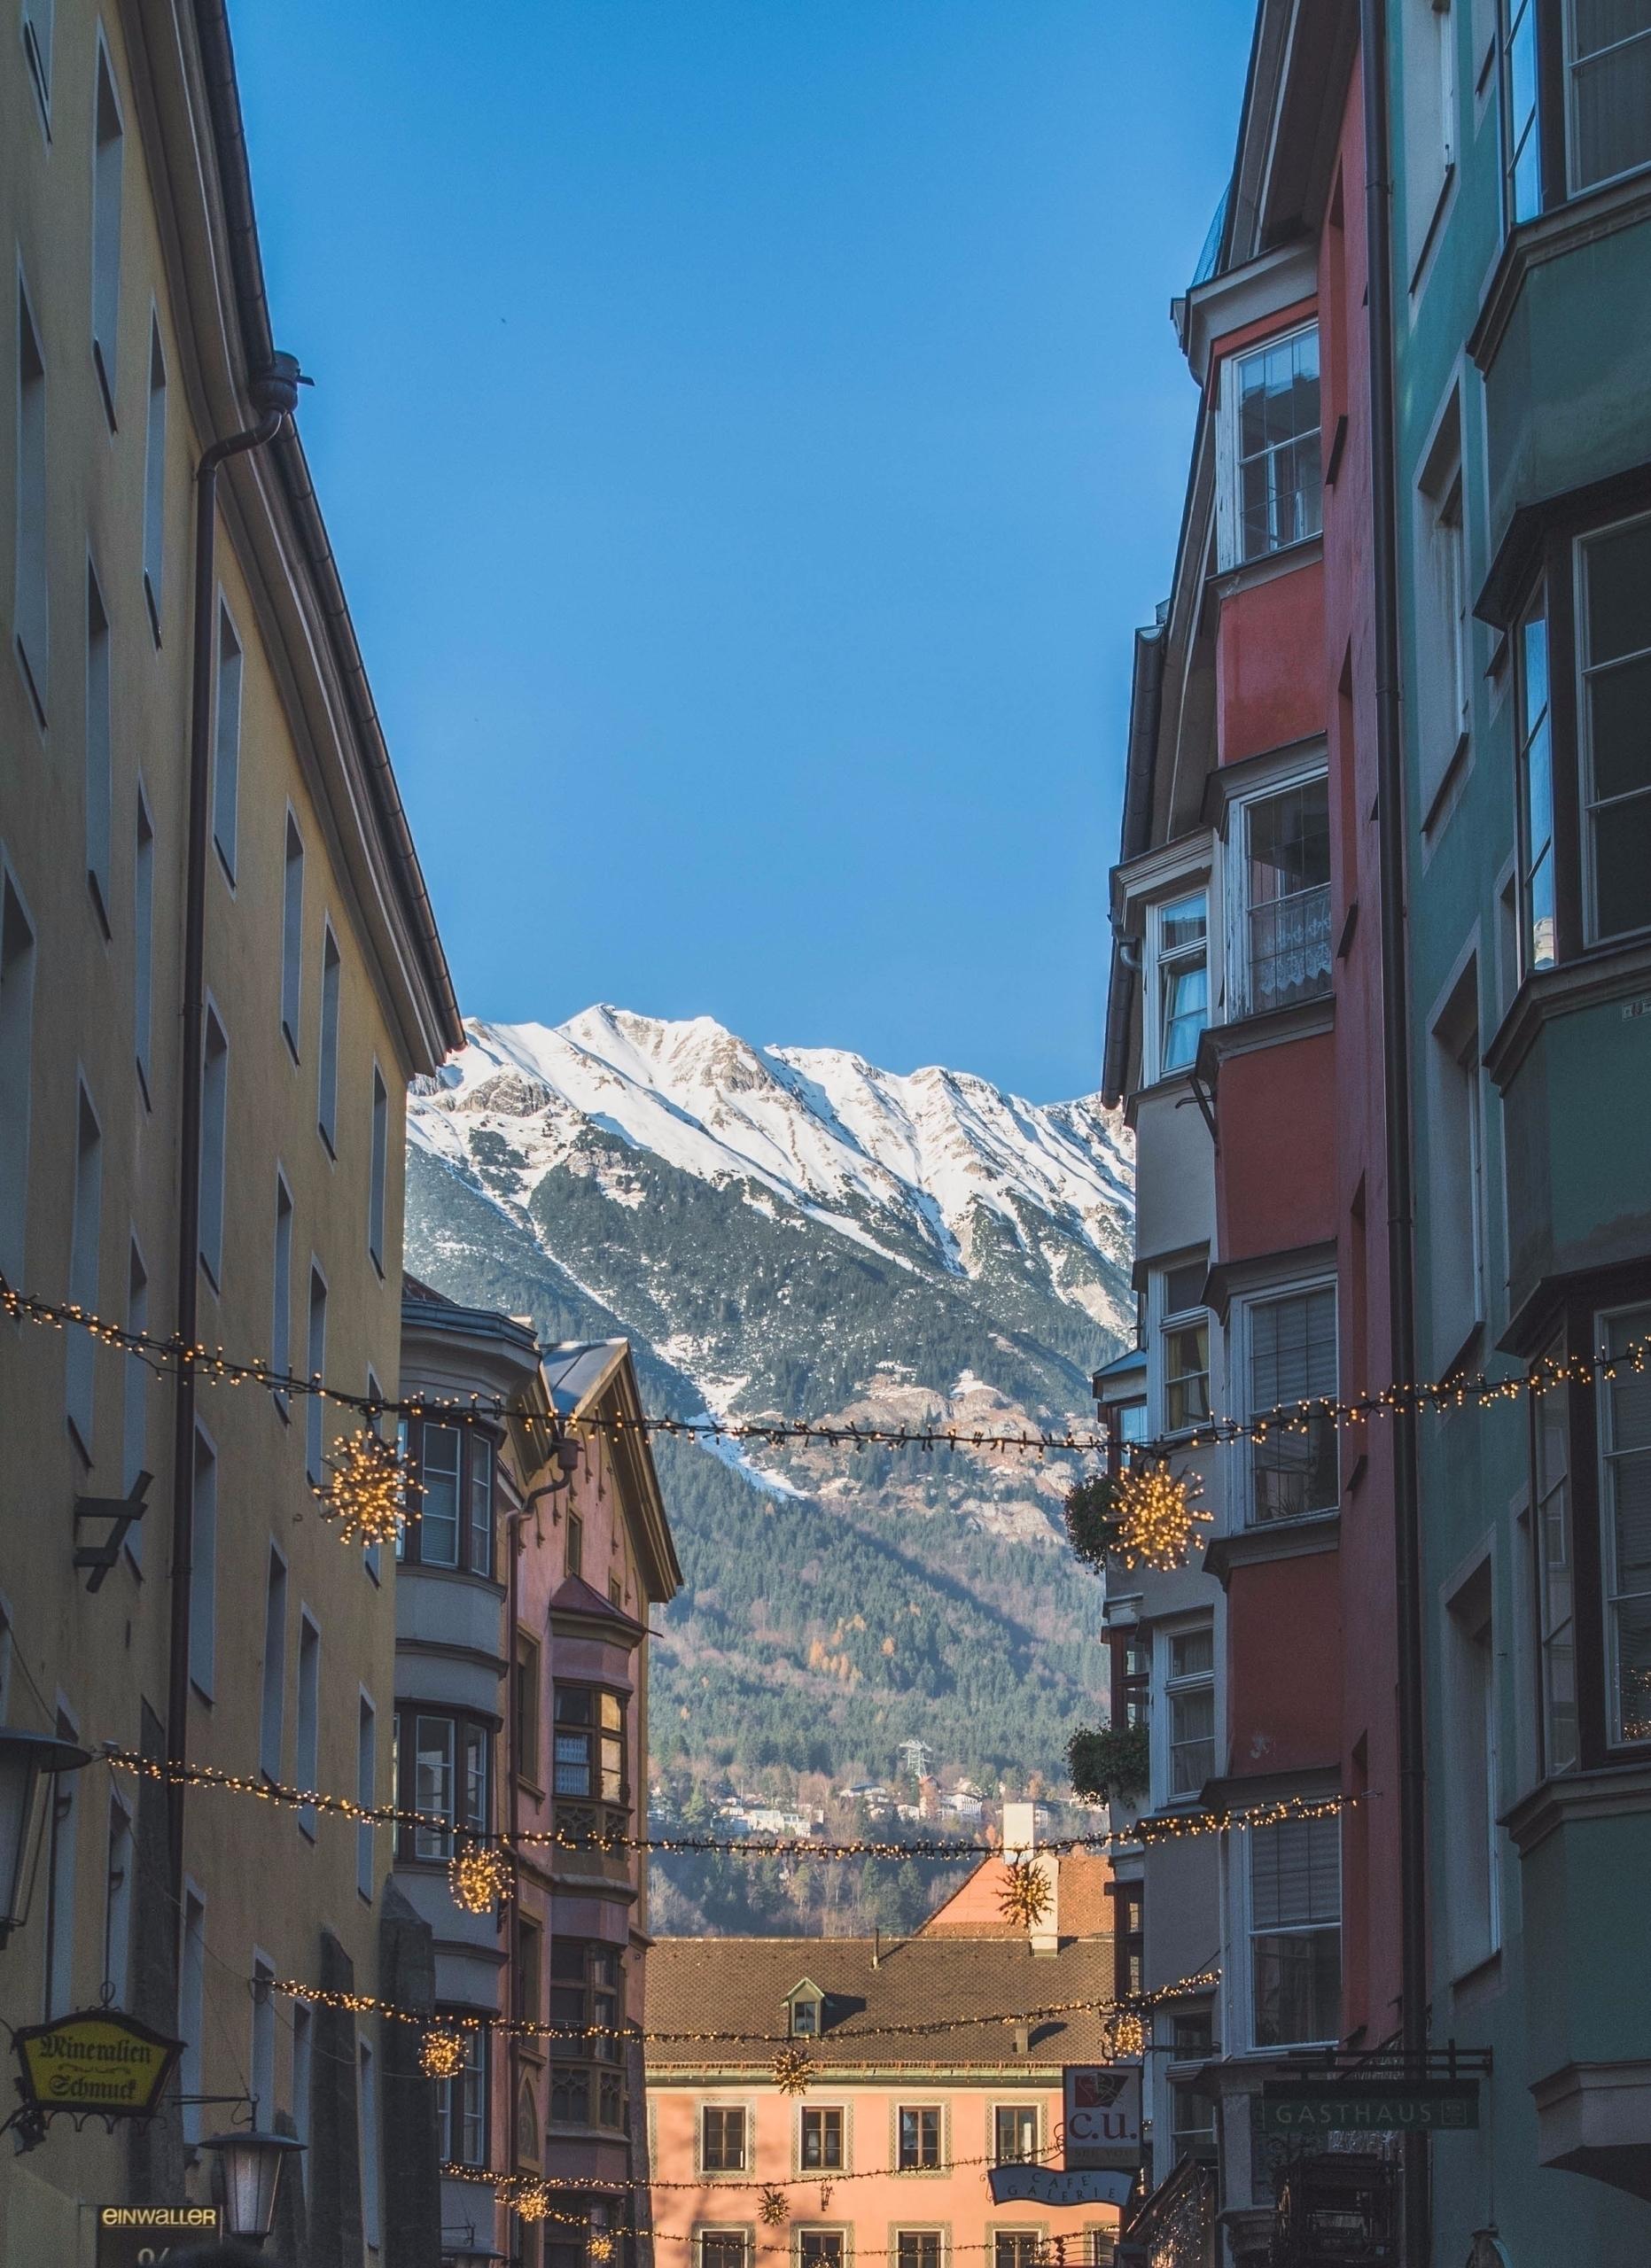 Alpes desde Insbruck Innsbruck - erjv   ello